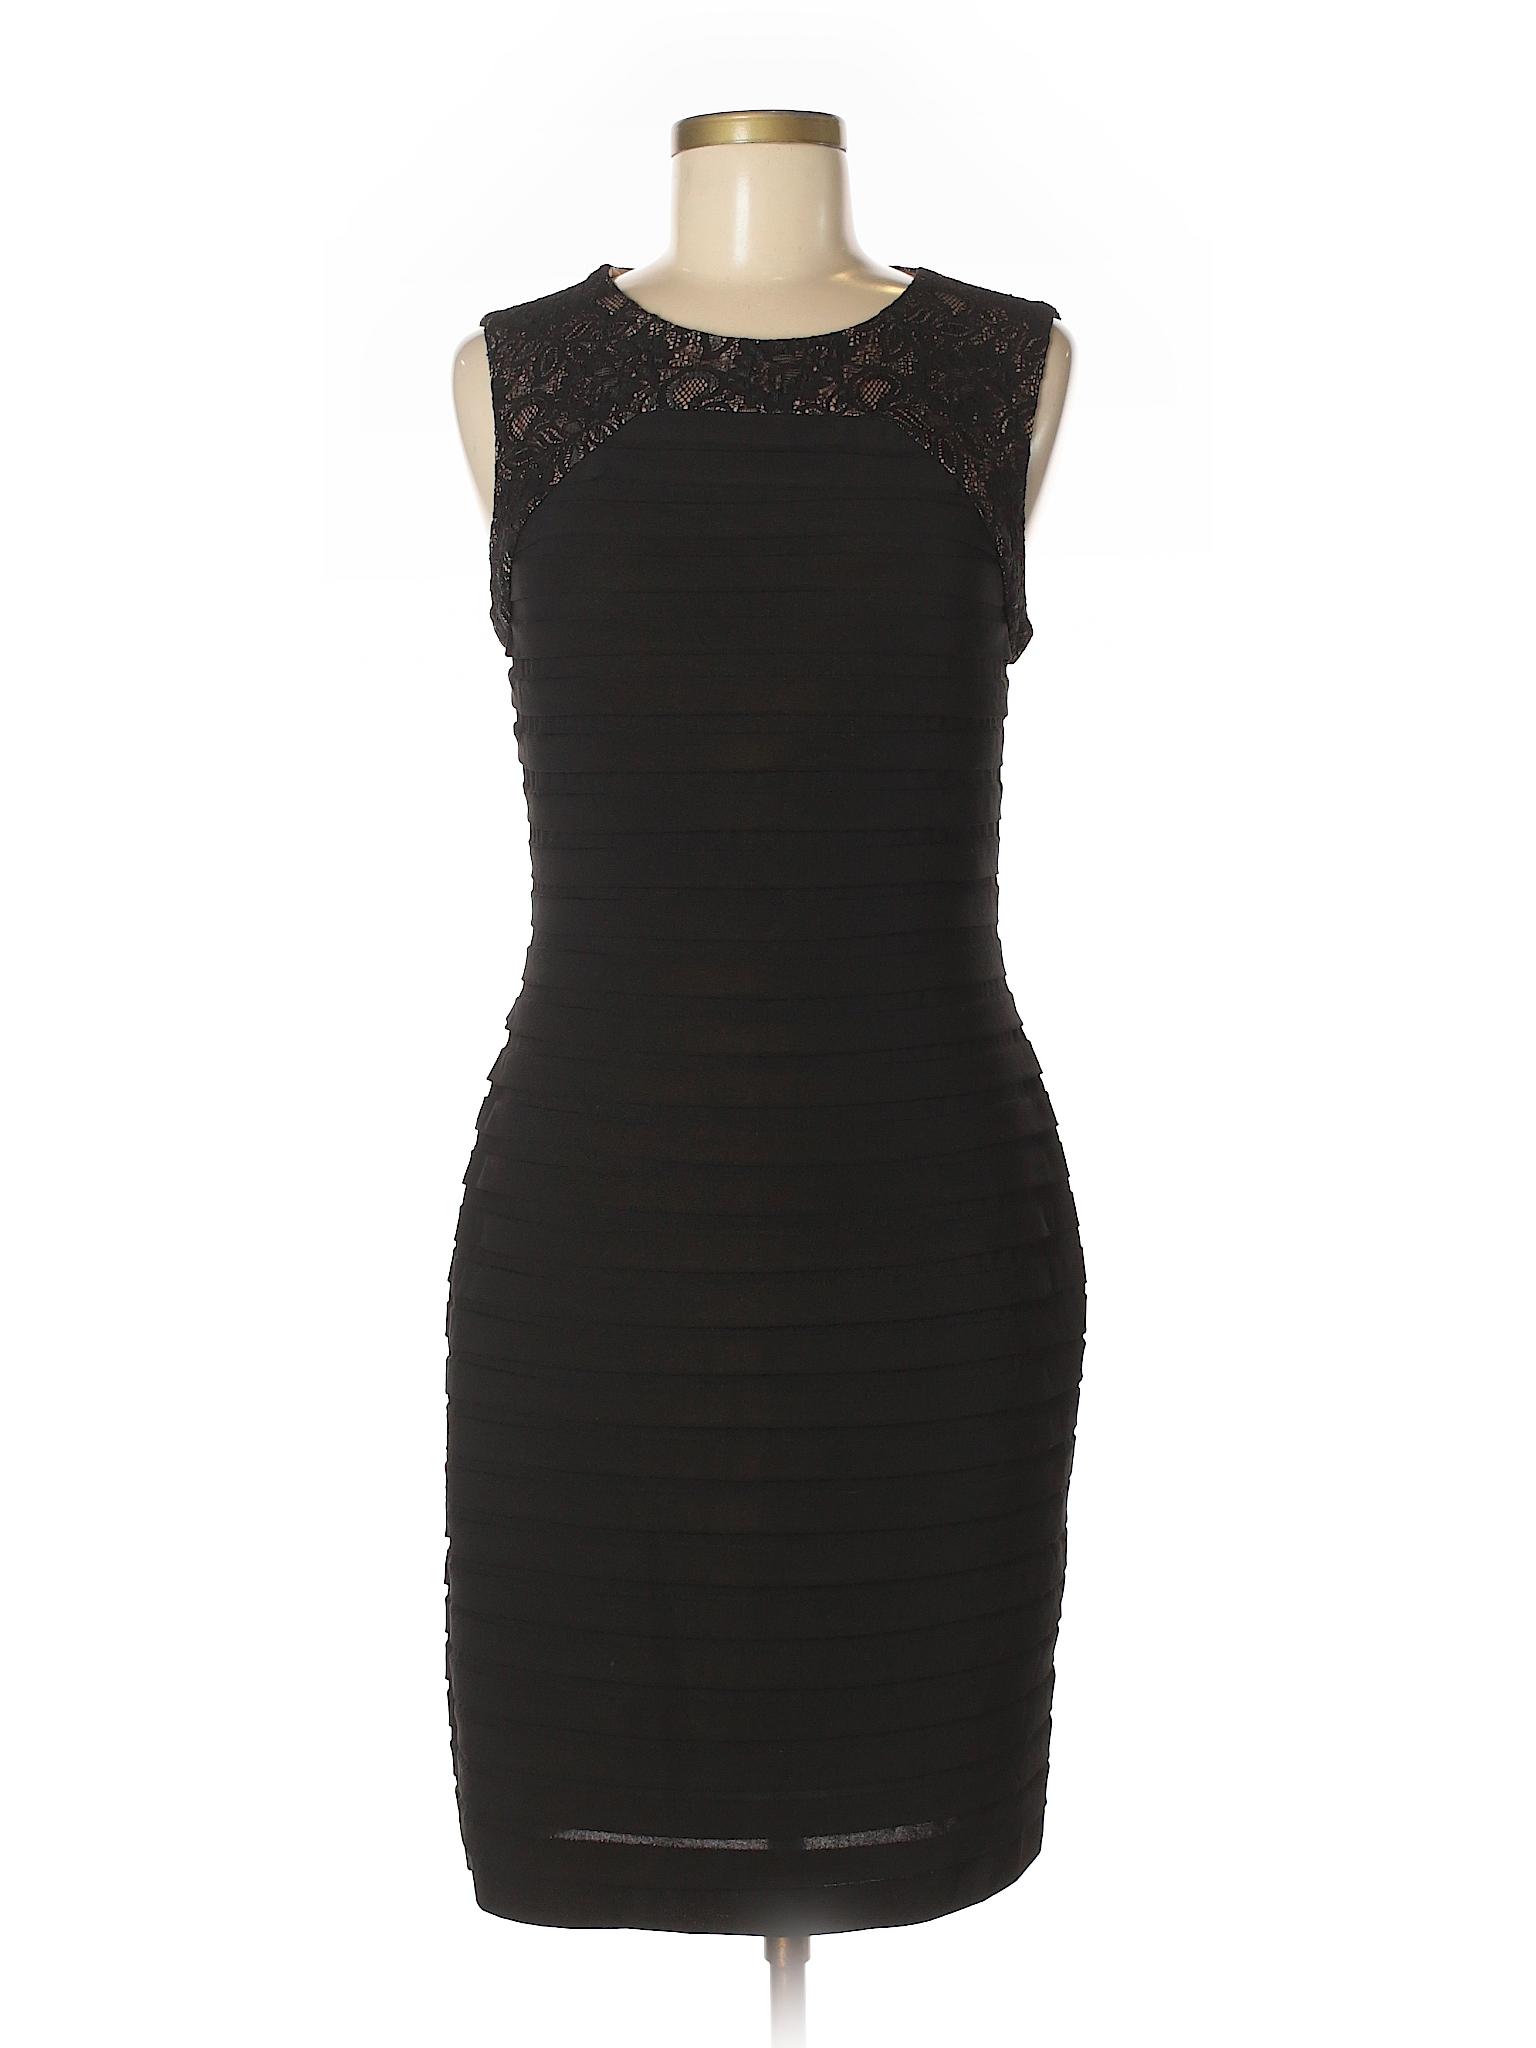 Papell Selling Casual Casual Casual Selling Selling Papell Adrianna Papell Adrianna Dress Dress Dress Adrianna x04qwSFH4